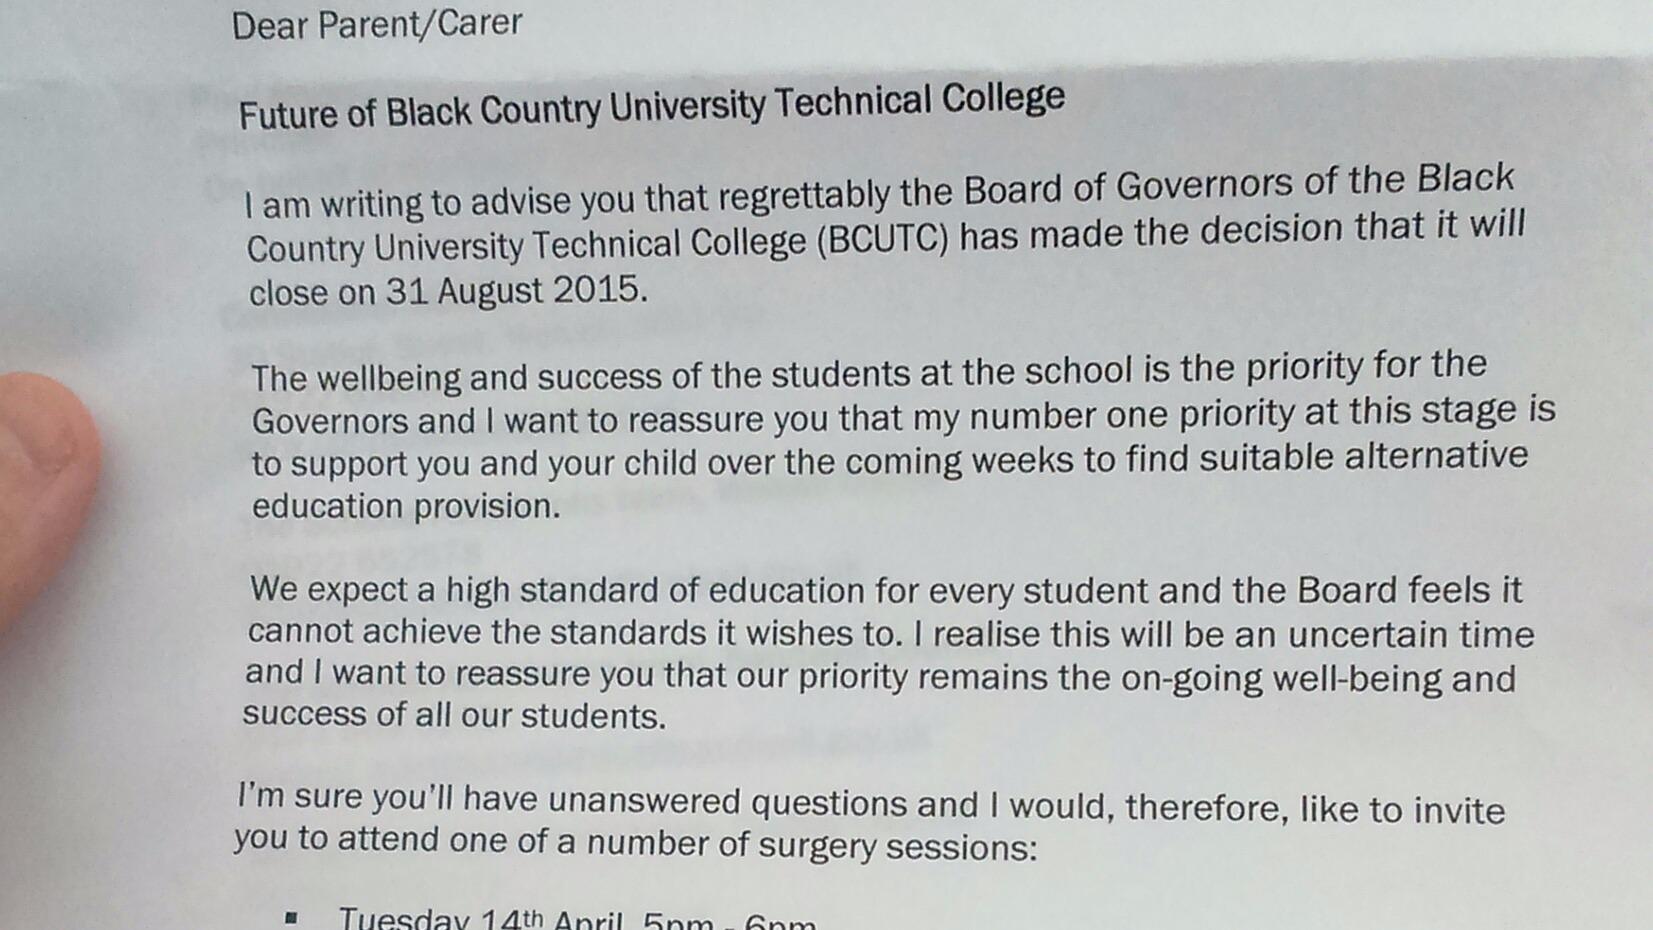 black country utc closure hundreds of pupils will need to black country utc closure hundreds of pupils will need to another school central news